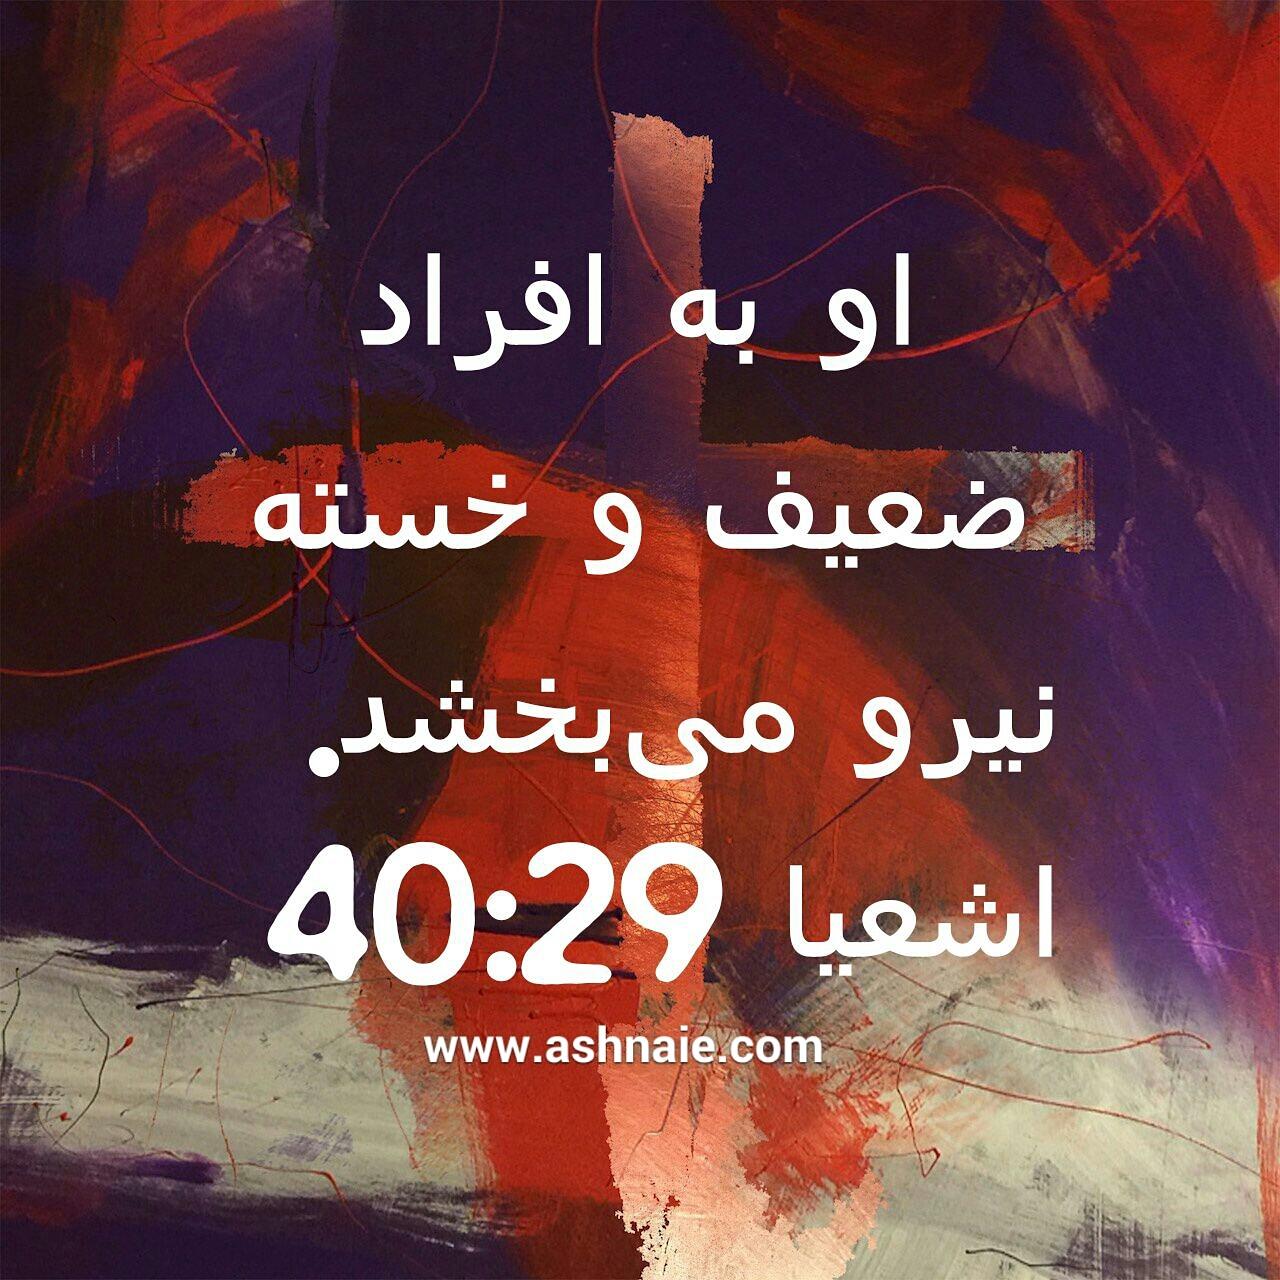 IMG_20180918_234533_732.jpg